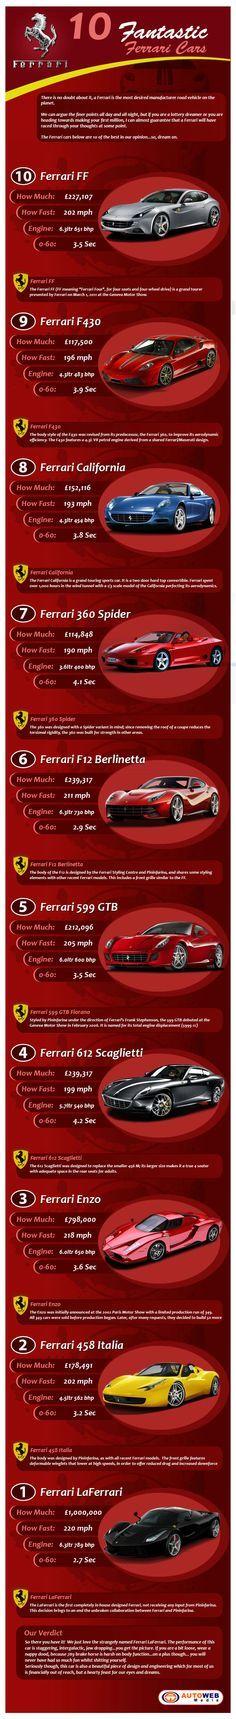 Ferrari Production Cars 10 Greatest Ferrari Production Cars of All Time   BrandonGaille.com